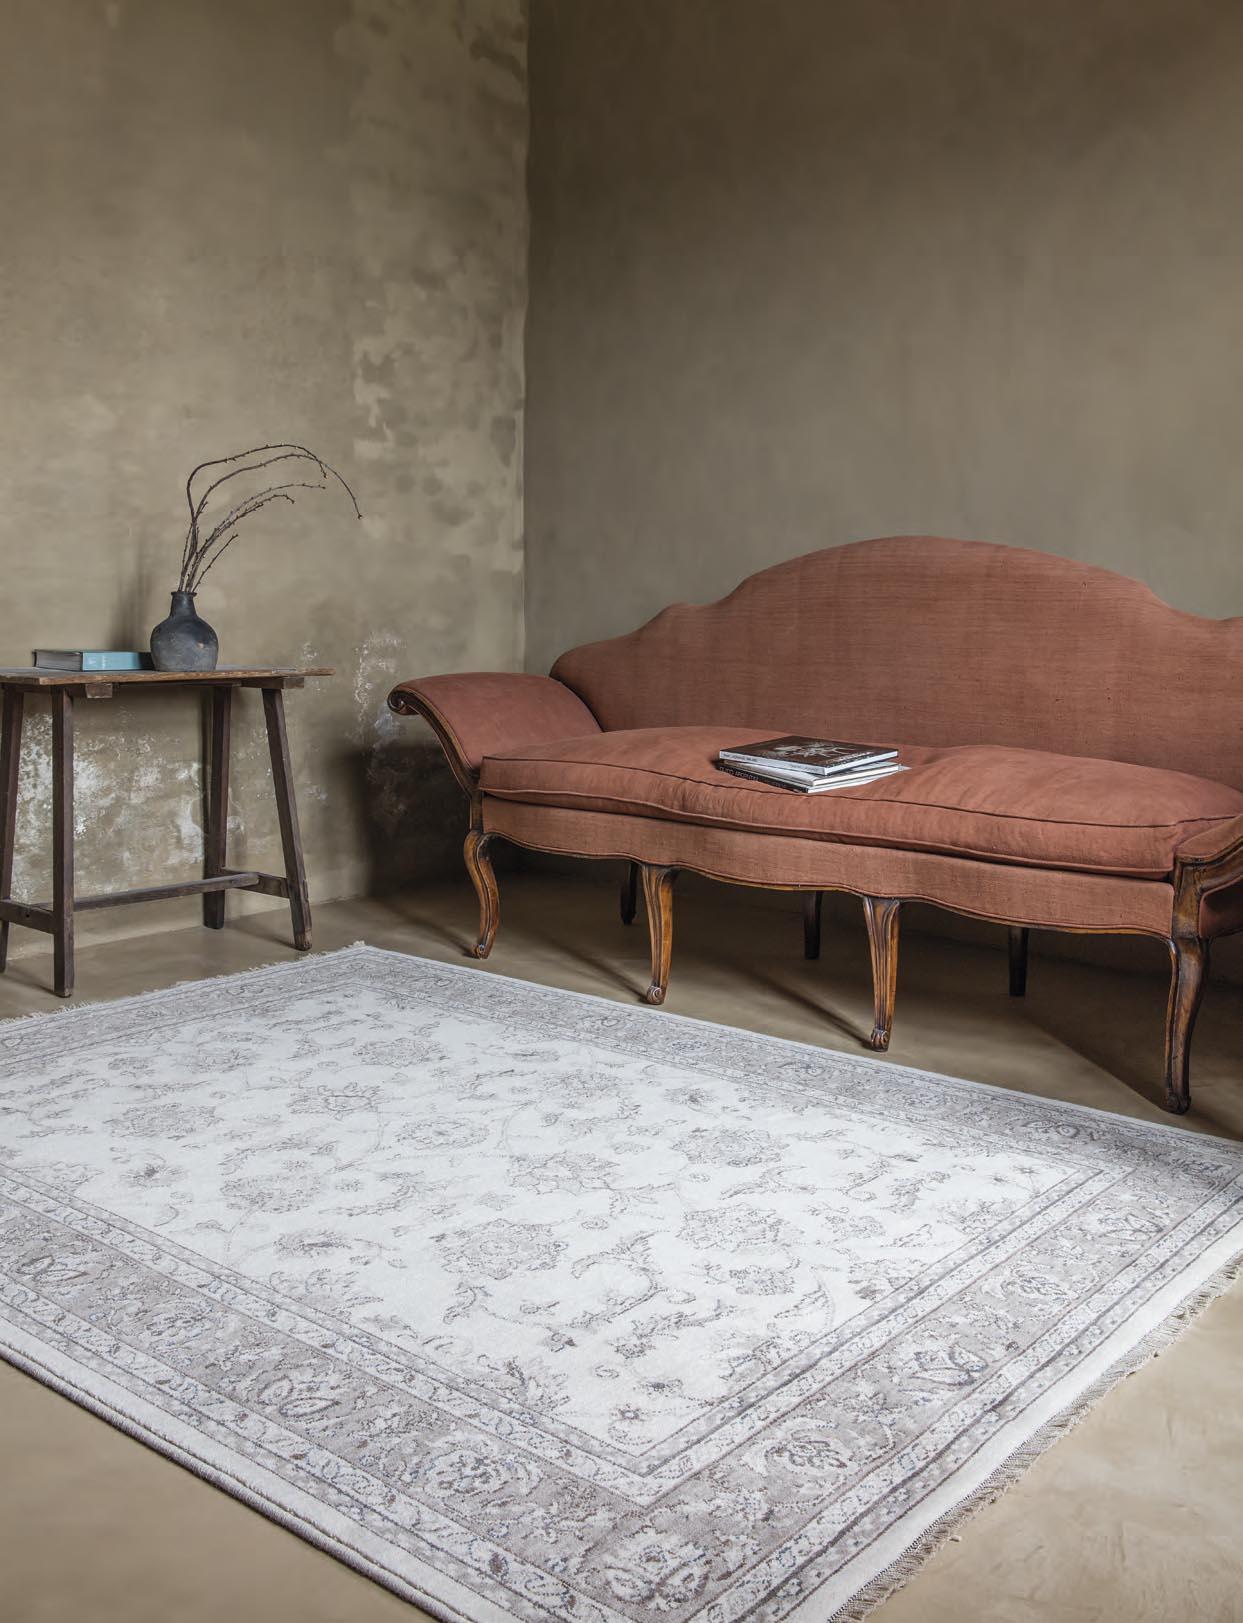 Recibidor con alfombra Osta Djobie 45.17.620